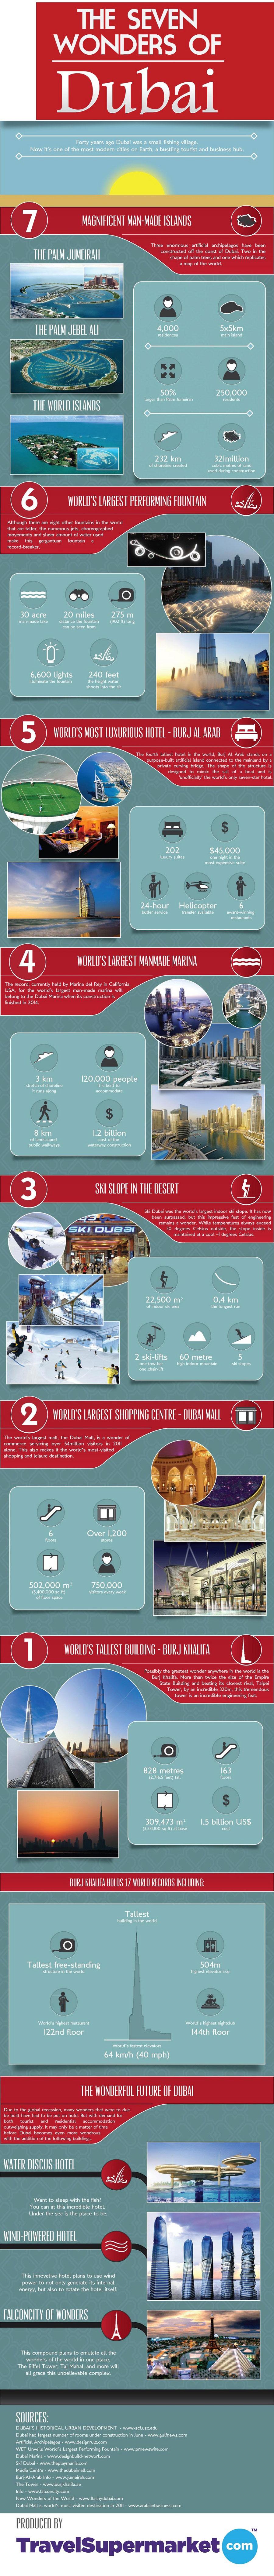 Dubai Wonderland-Infographic